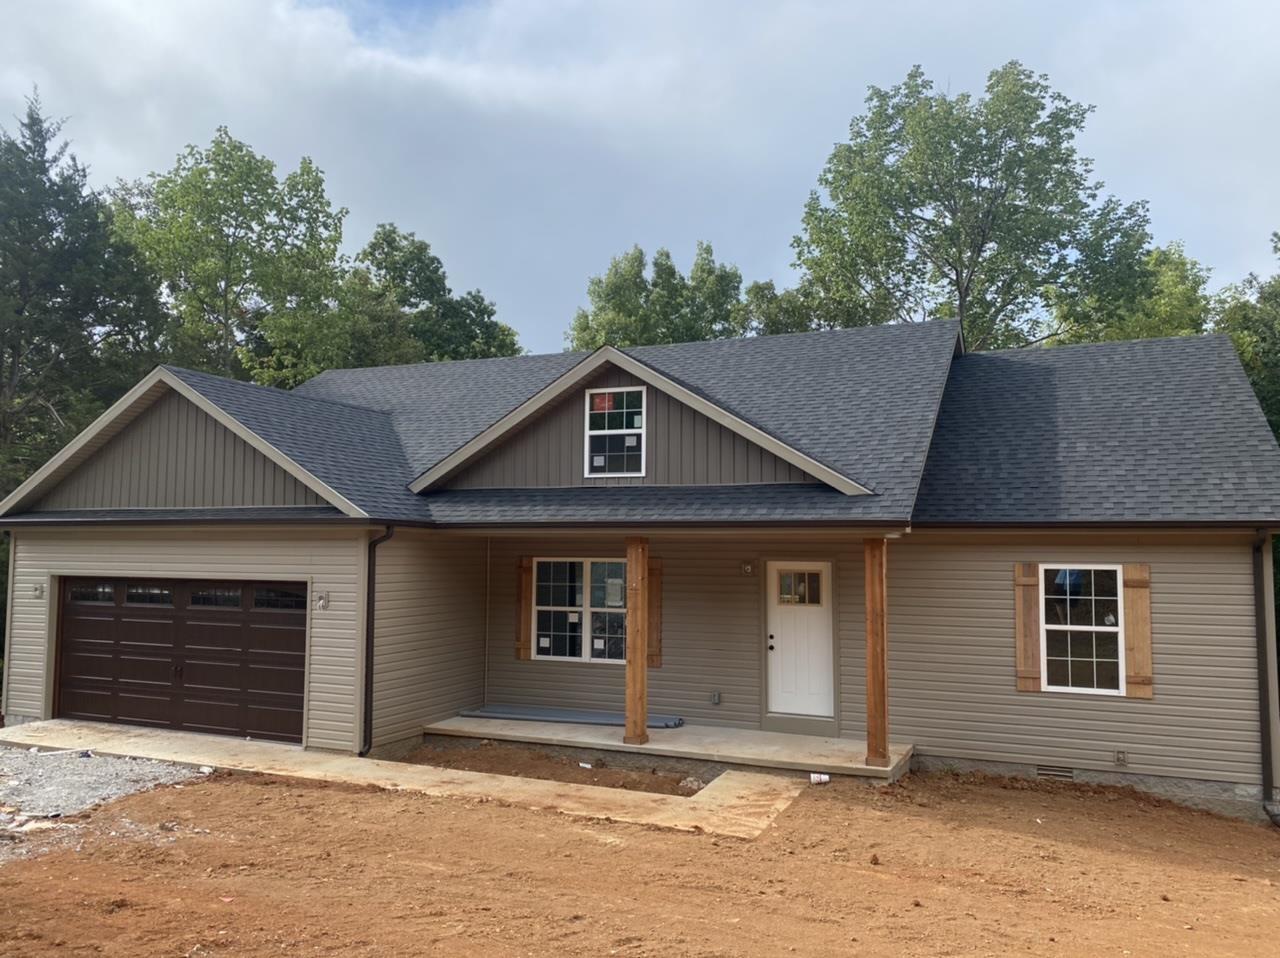 147 Cortaire Drive, Auburn, KY 42206